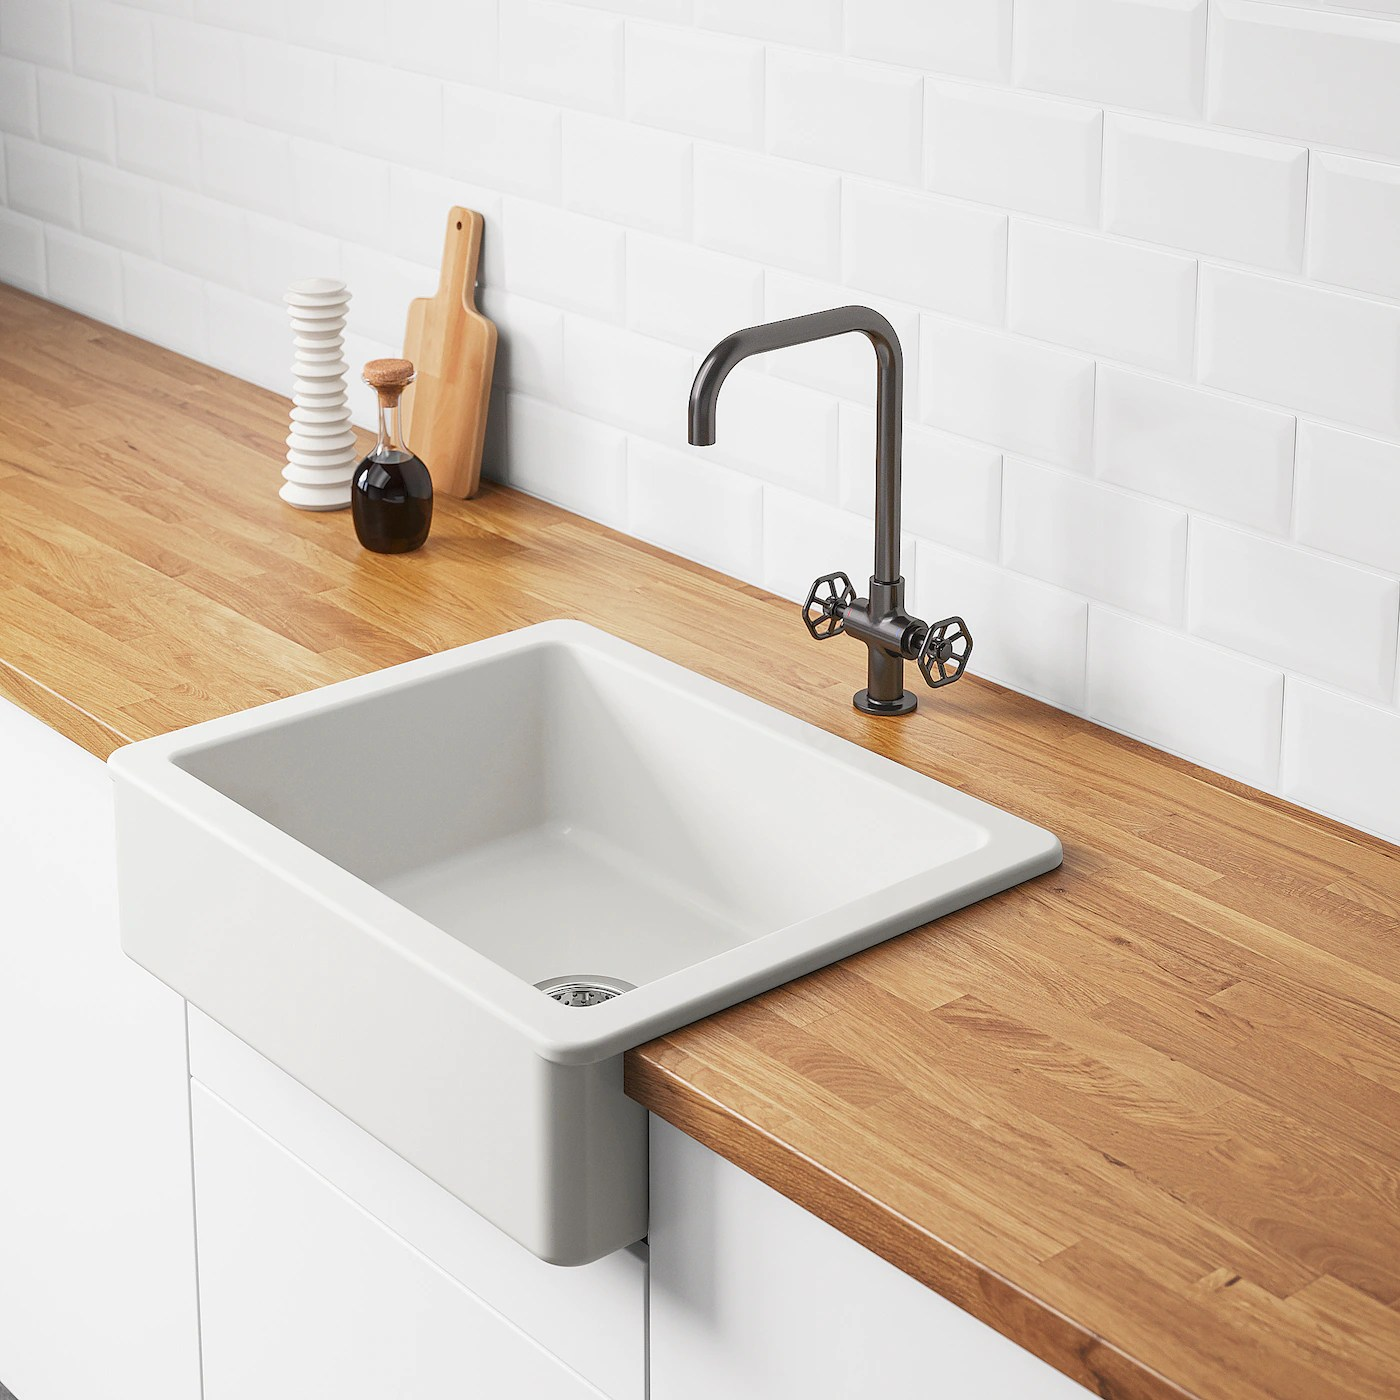 havsen apron front sink white 25x19